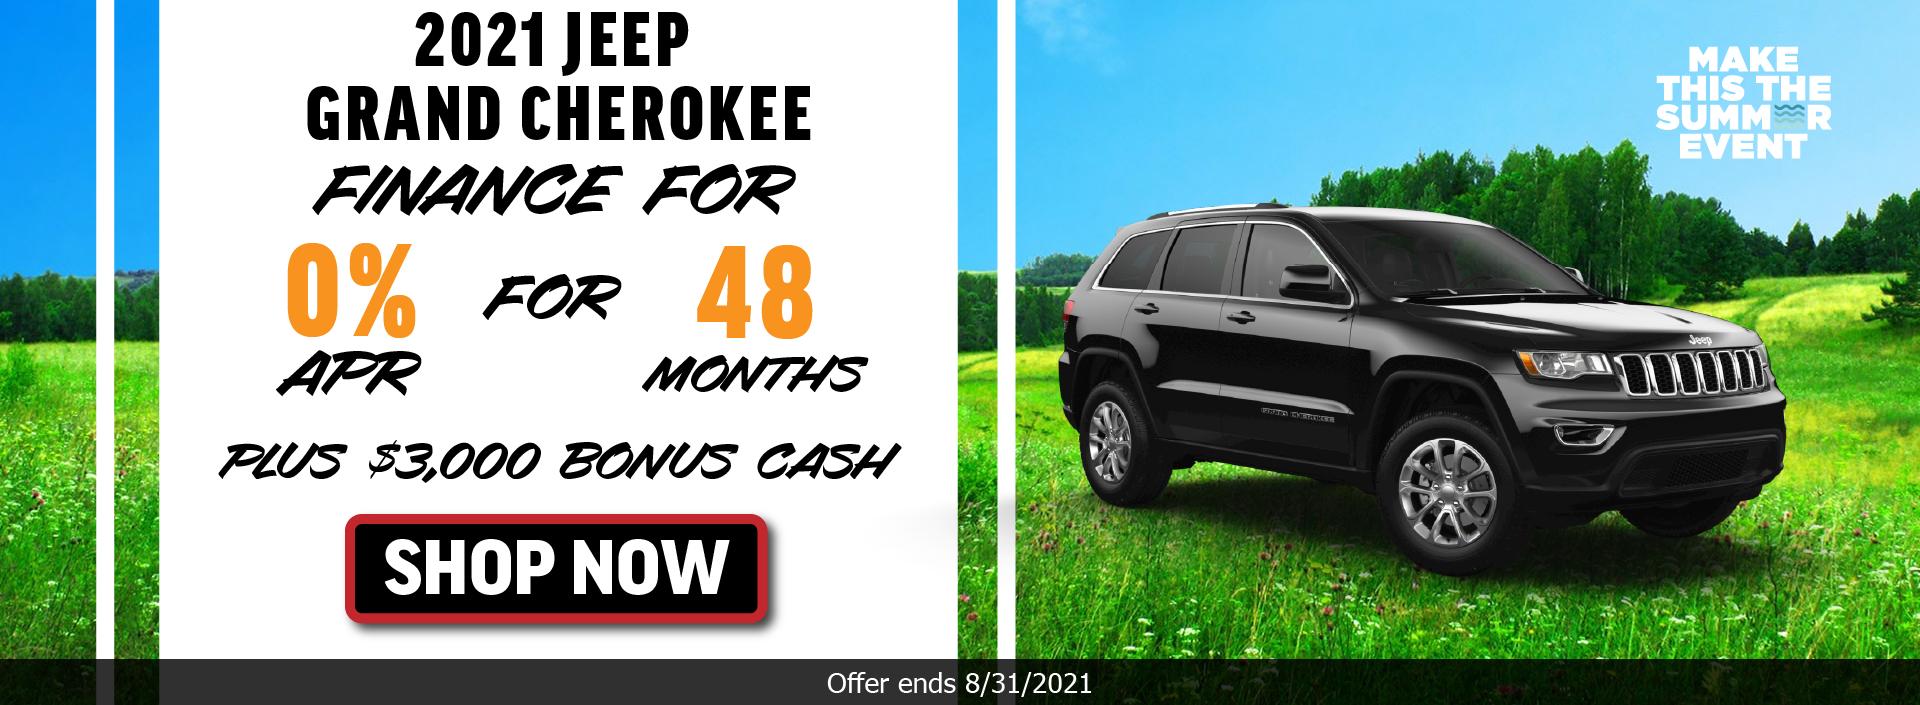 2021 Jeep Grand Cherokee_August